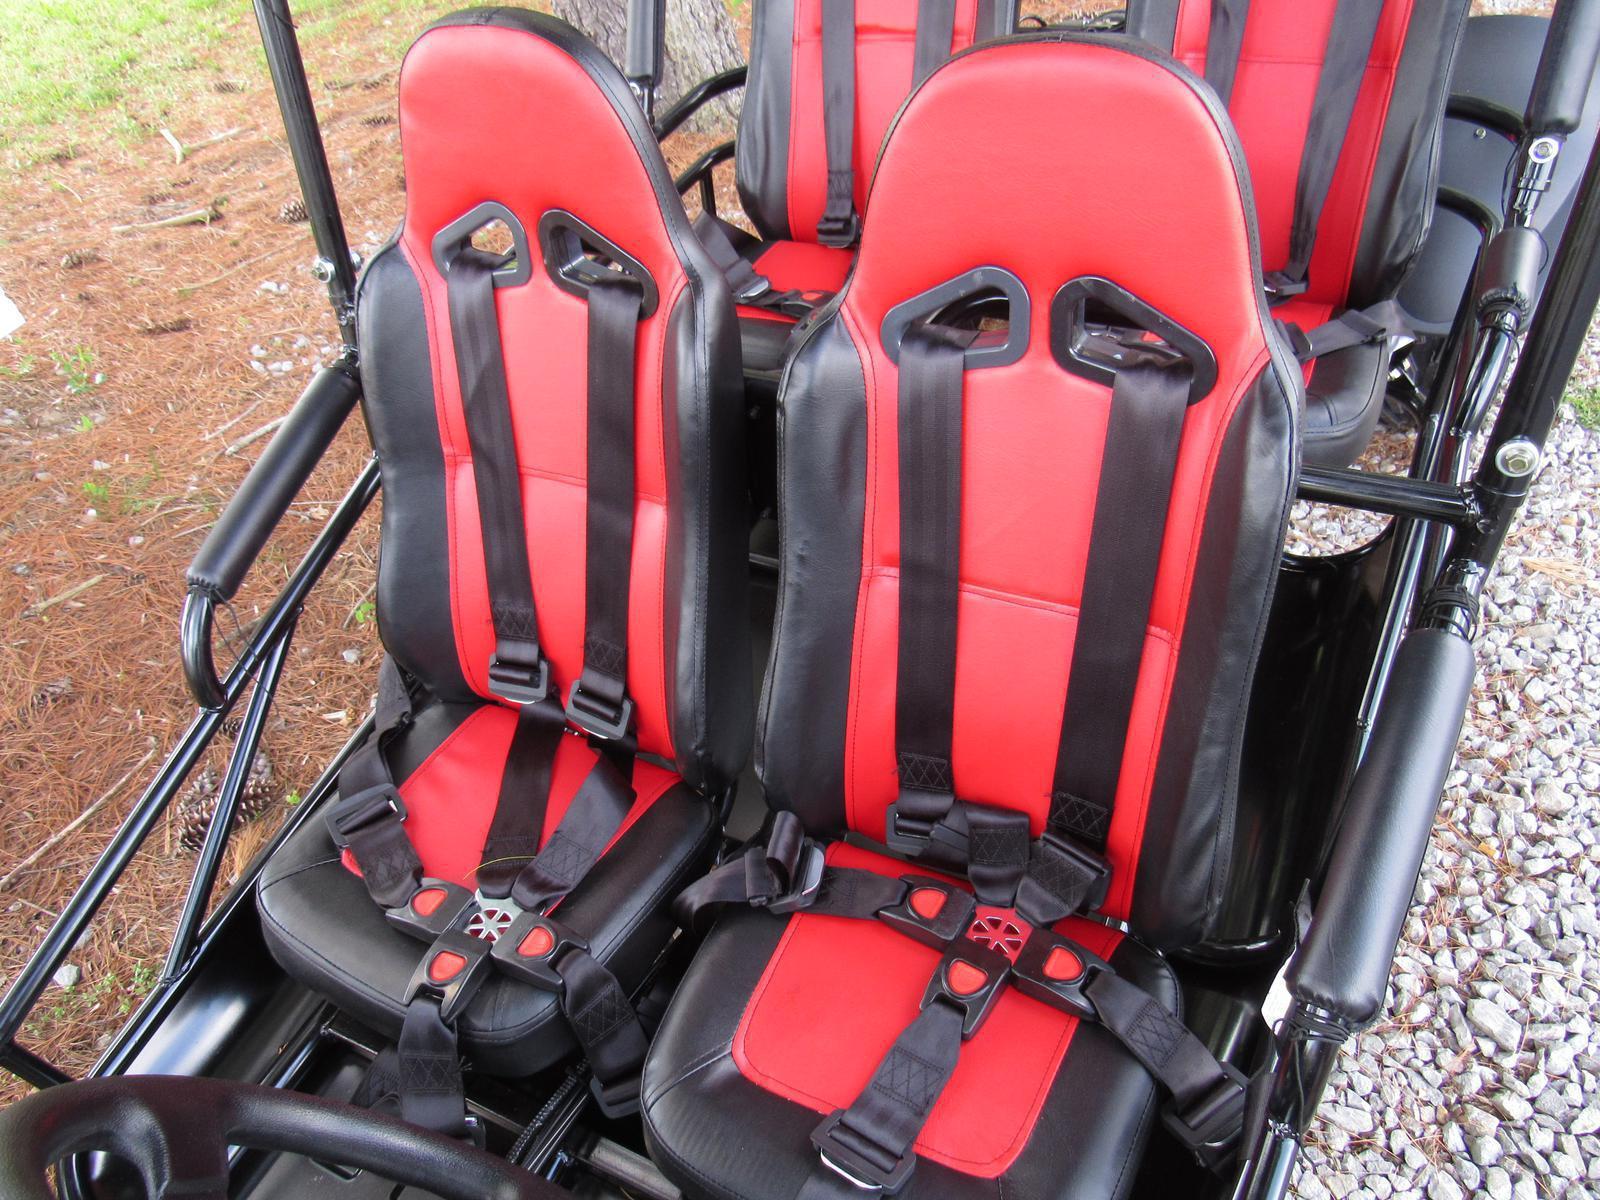 Kart Harness Sunl Go Wiring Trailmaster Blazer Seat Special Order For Sale 1600x1200